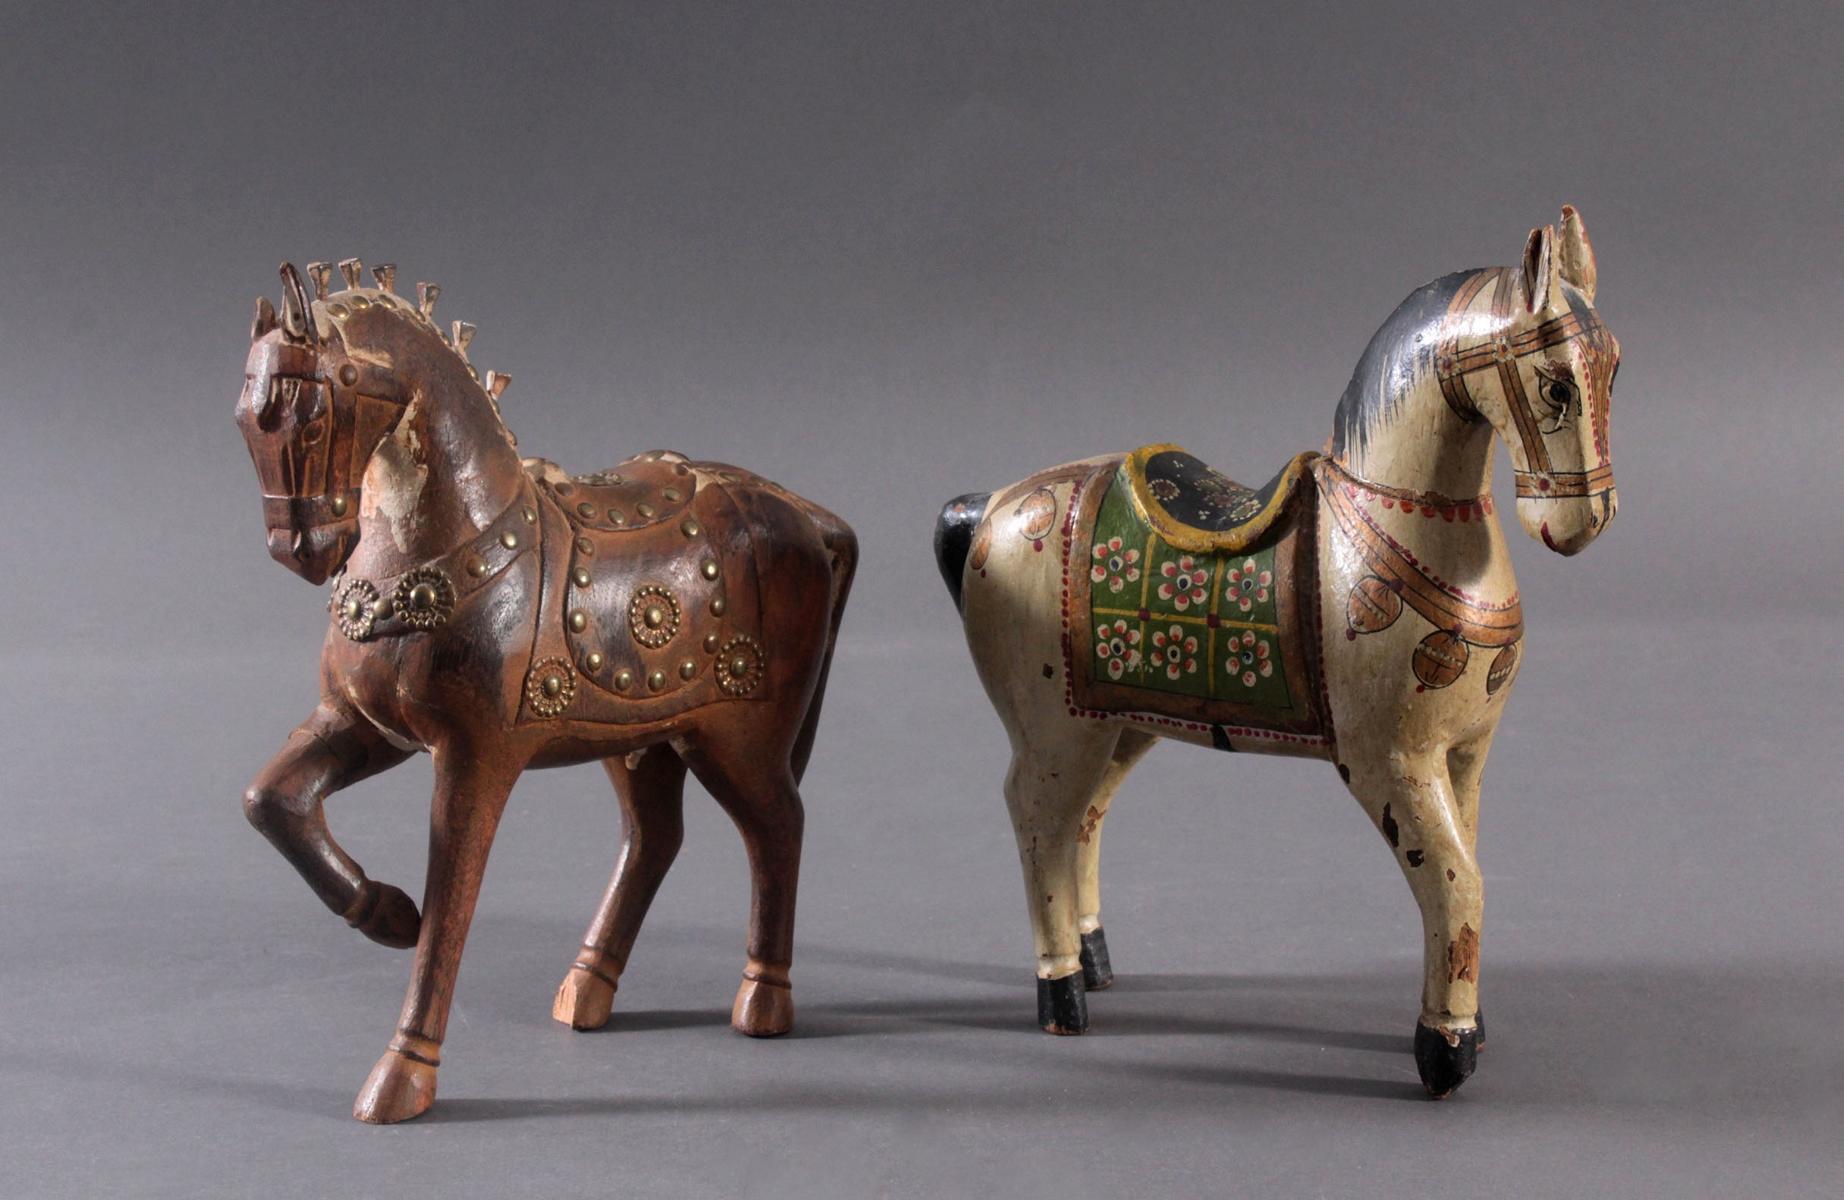 2 Pferdeskulpturen aus Holz 1. Hälfte 20. Jh.